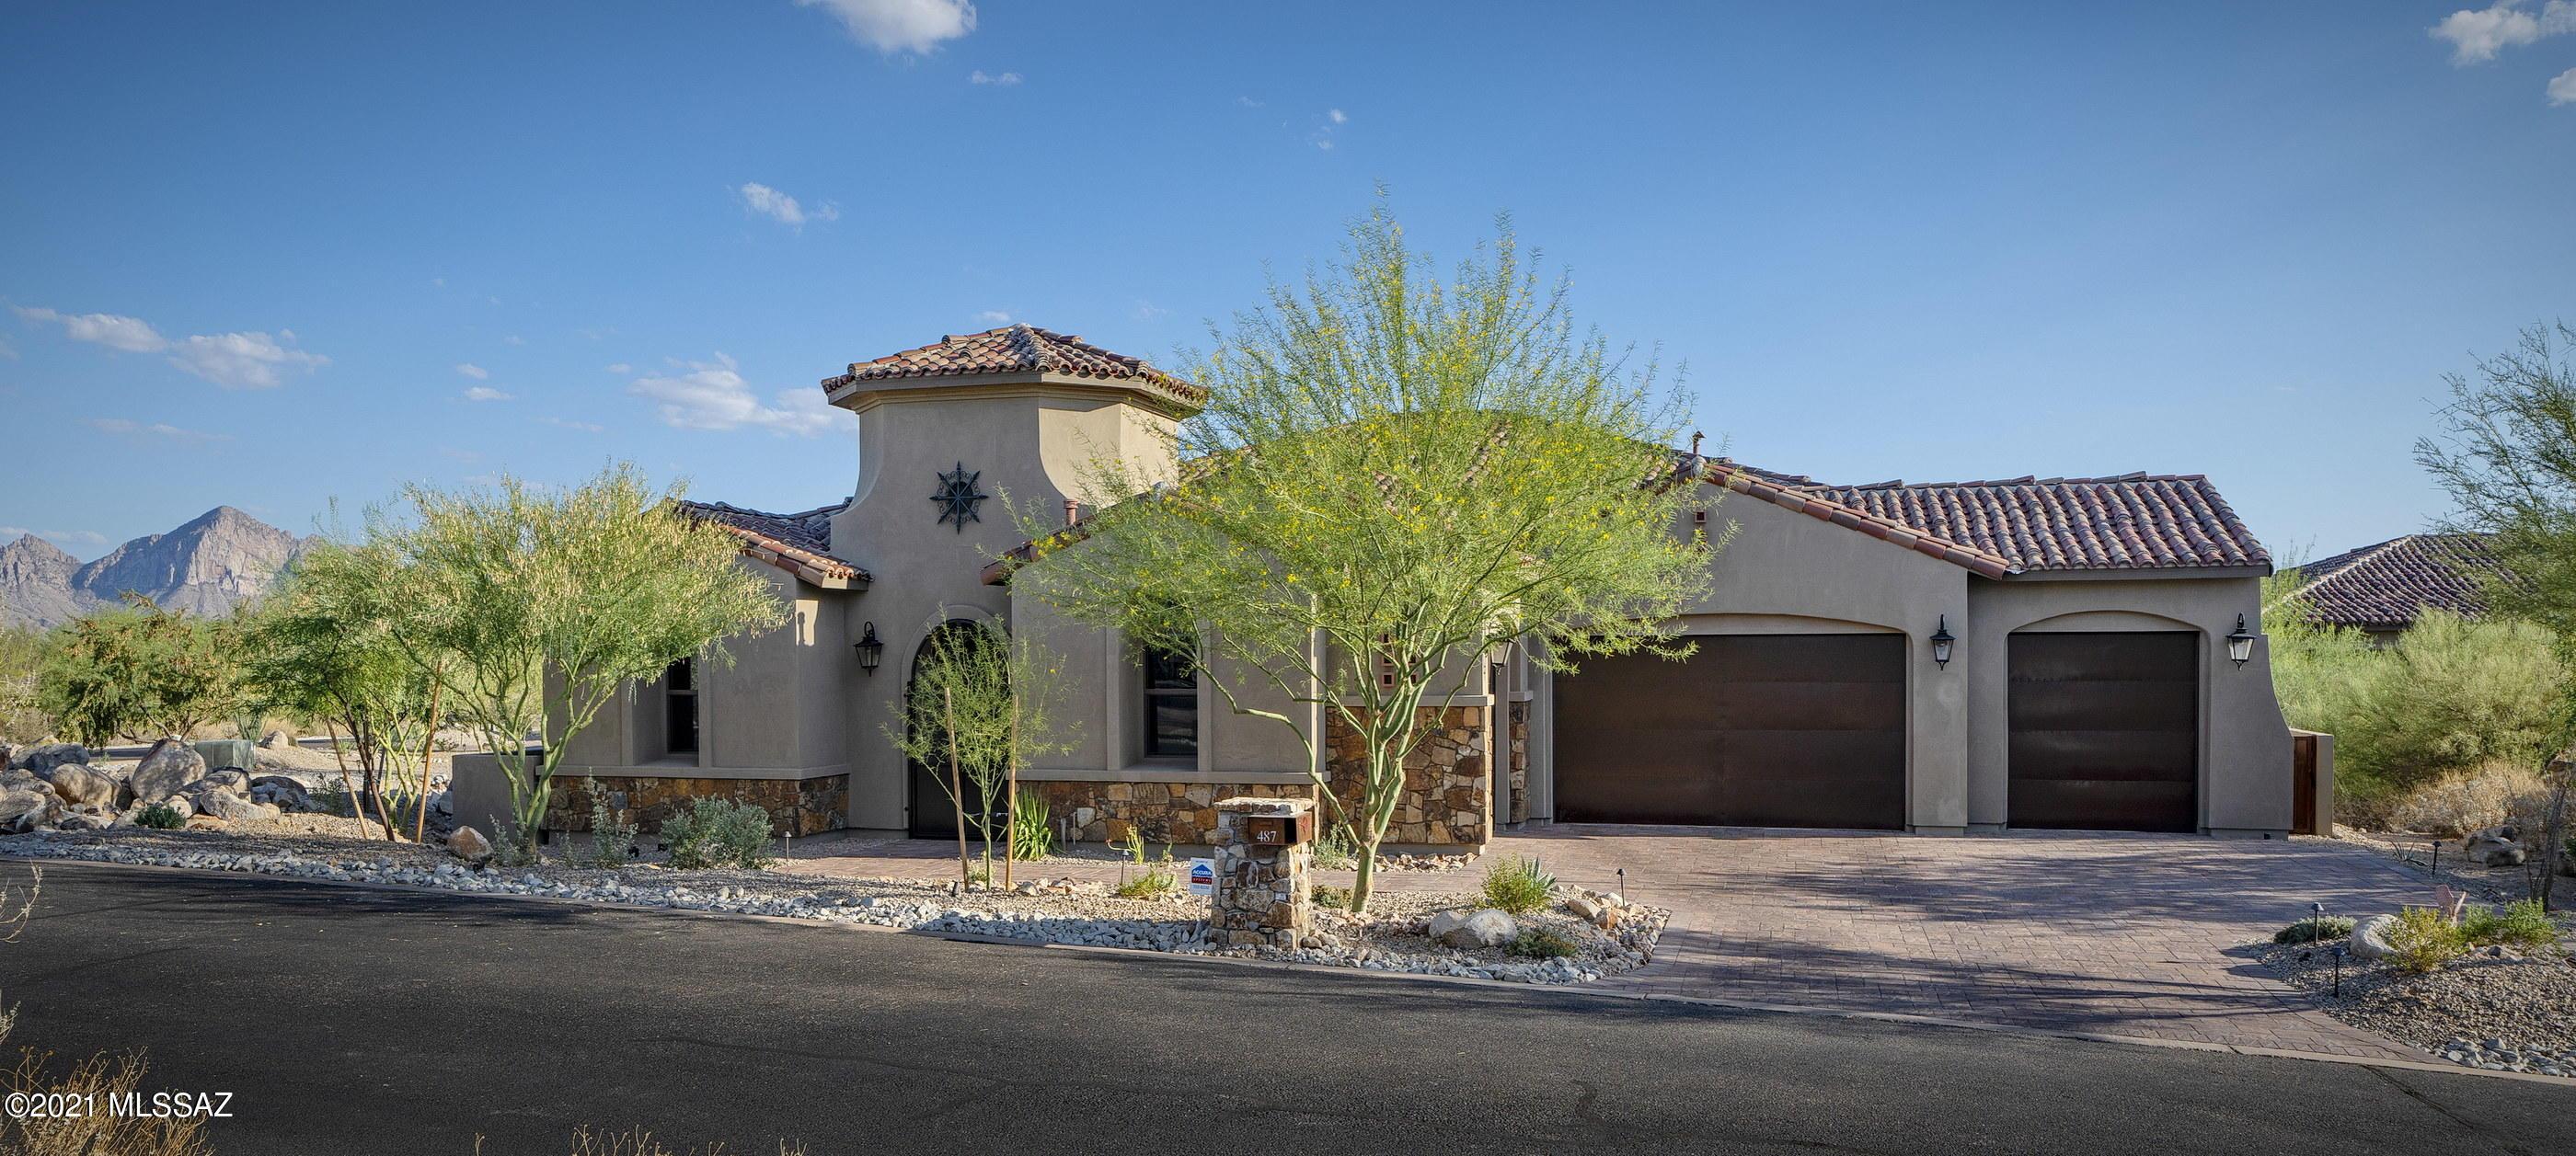 Photo of 487 W Echo Point Place, Oro Valley, AZ 85755